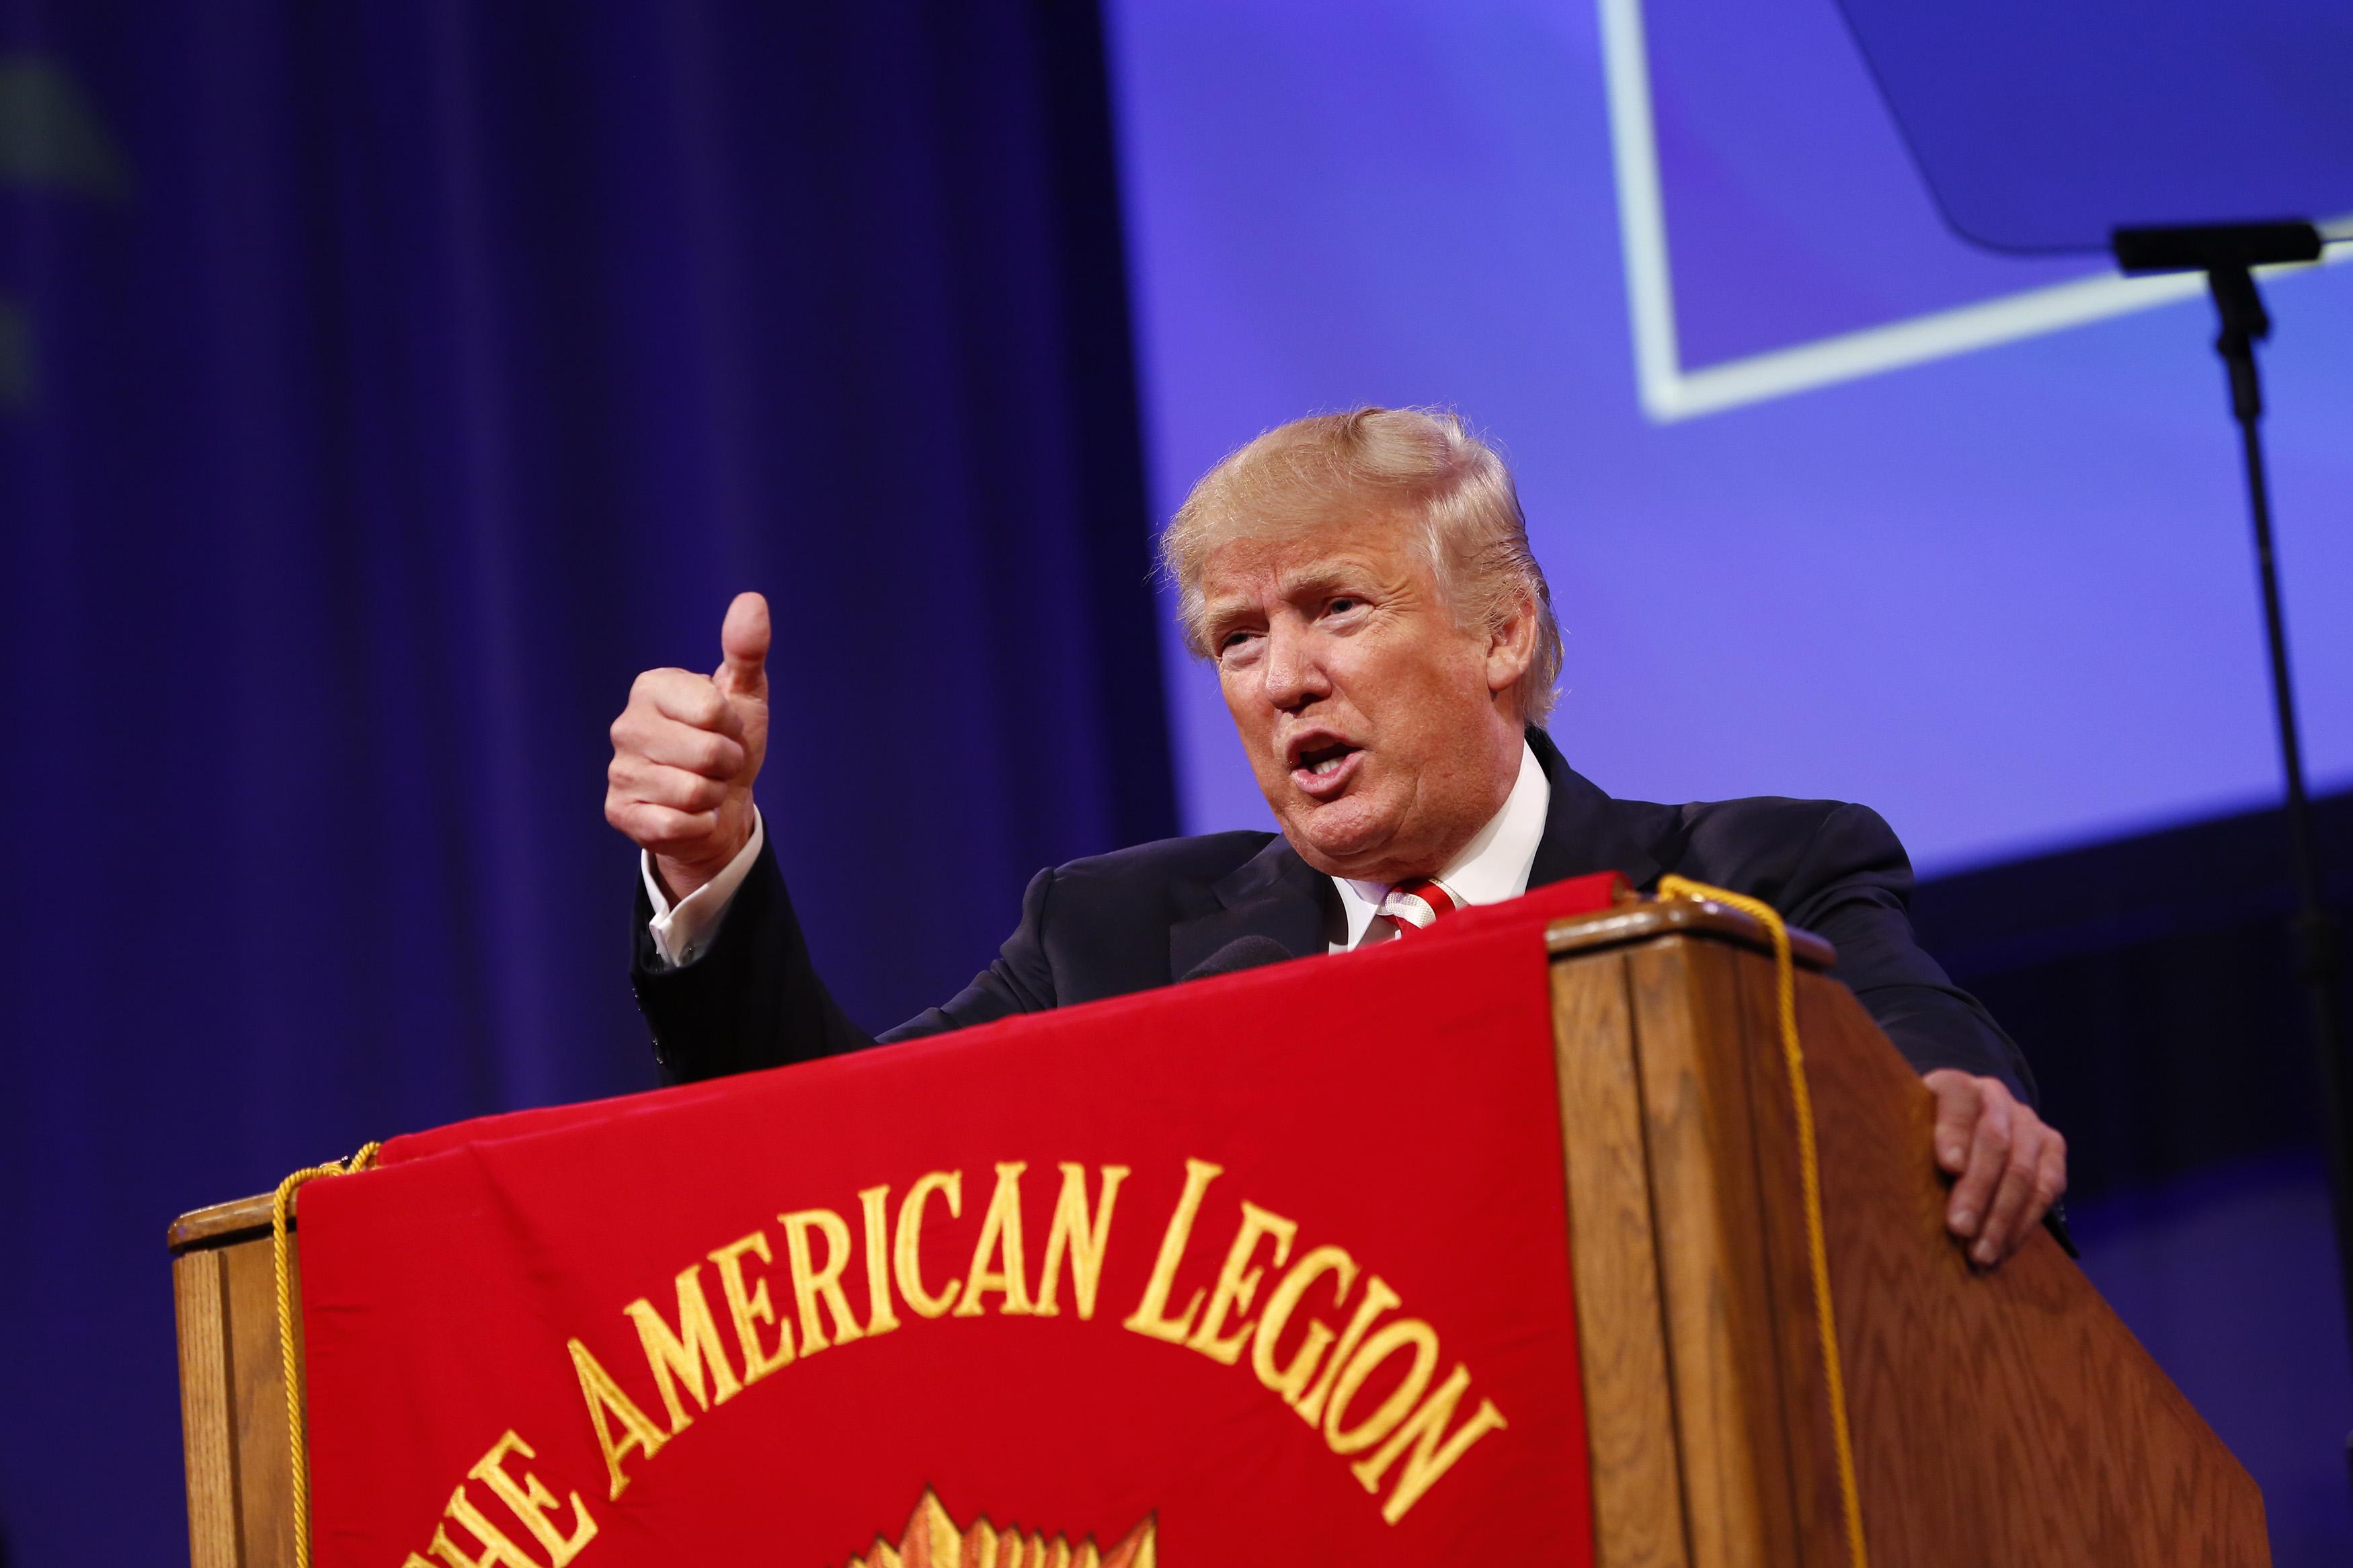 Republican presidential candidate Donald Trump speaks at the American Legion Convention September 1, 2016 in Cincinnati, Ohio. T